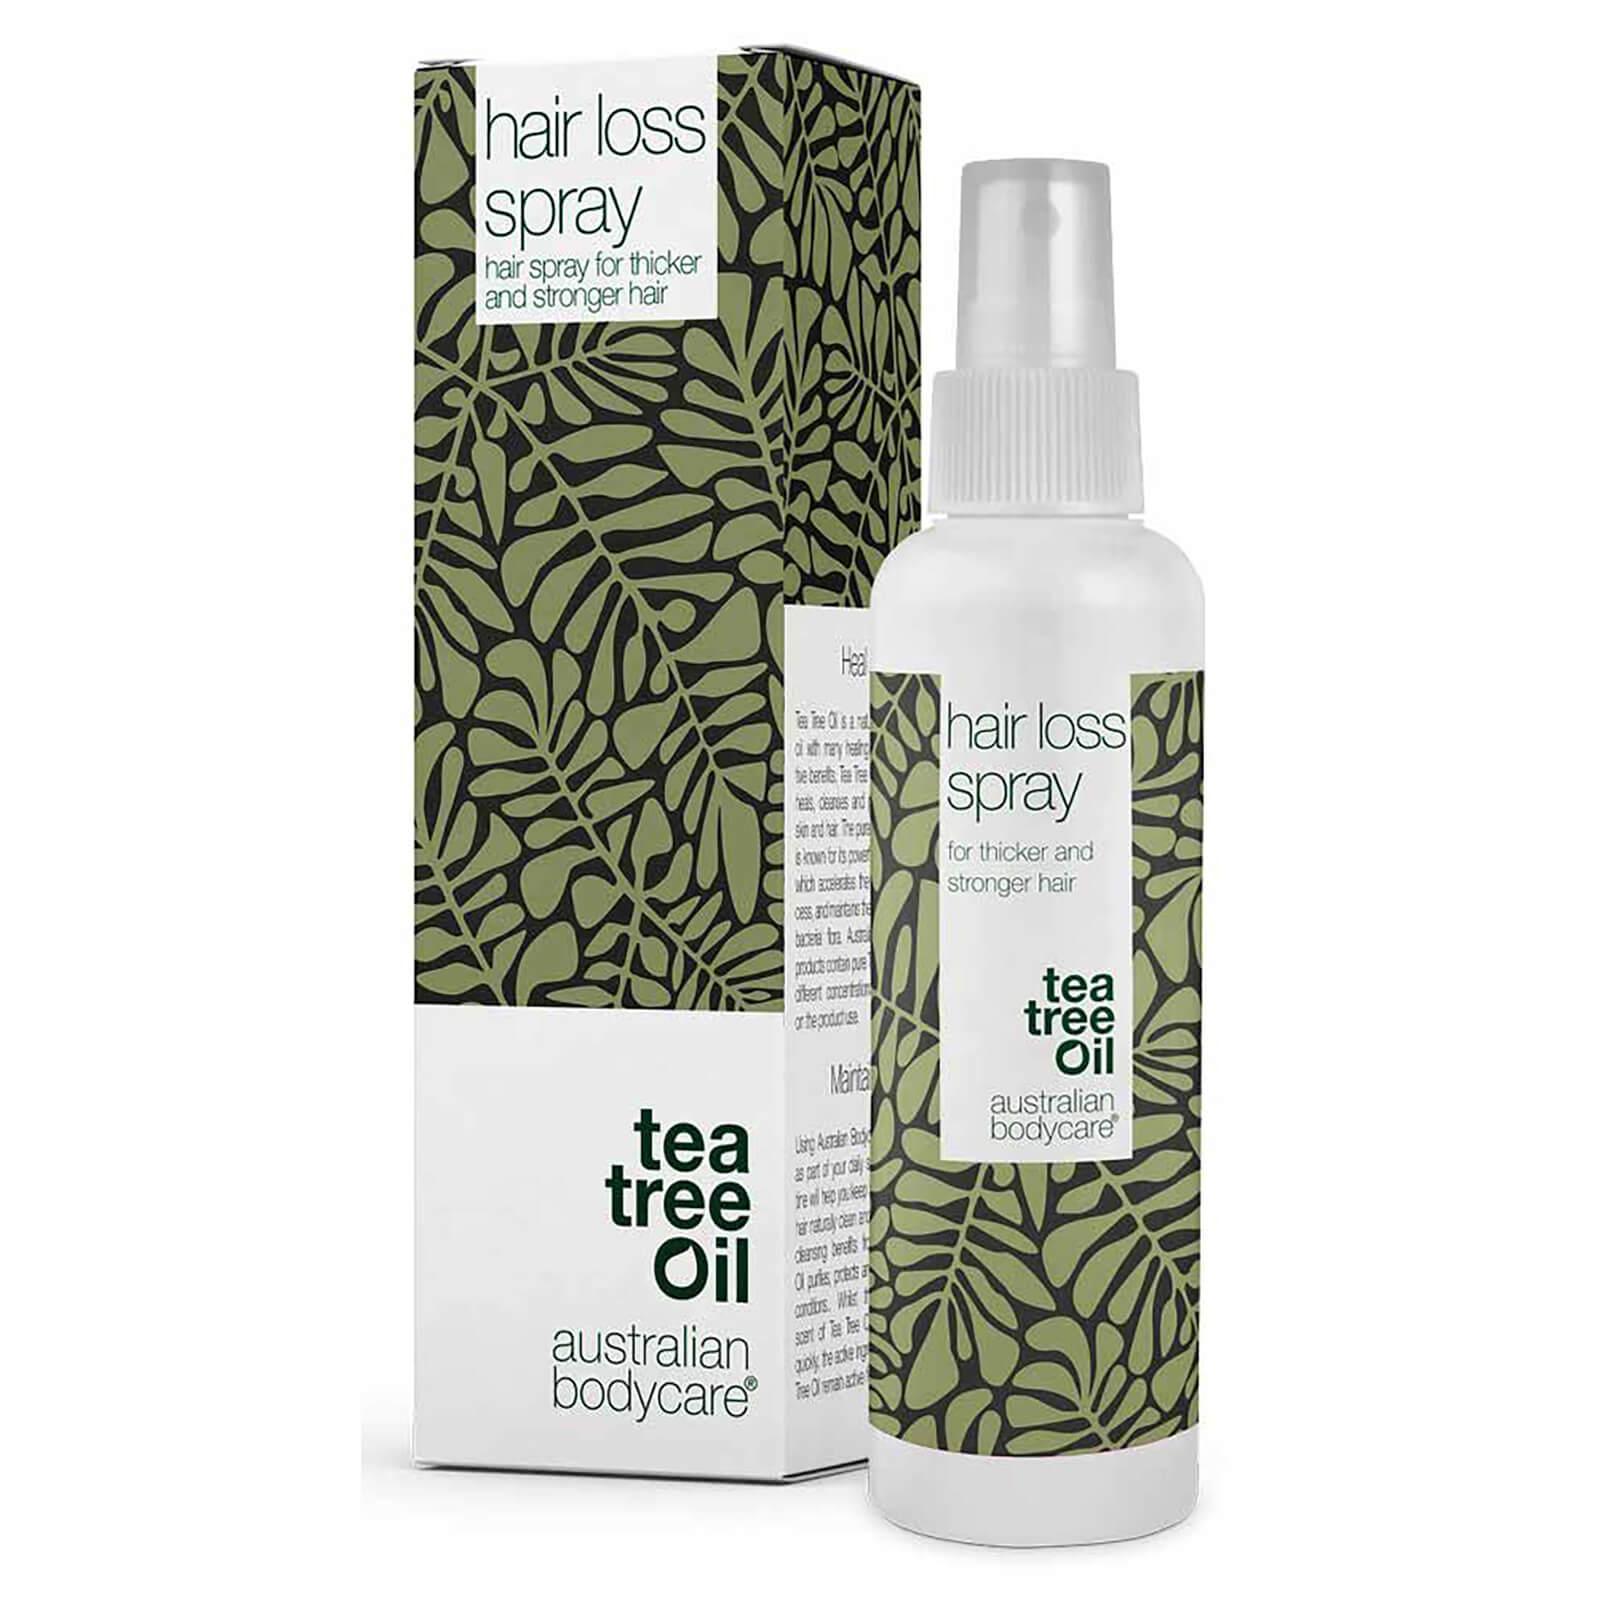 Купить Australian Bodycare Hair Loss Spray 150ml